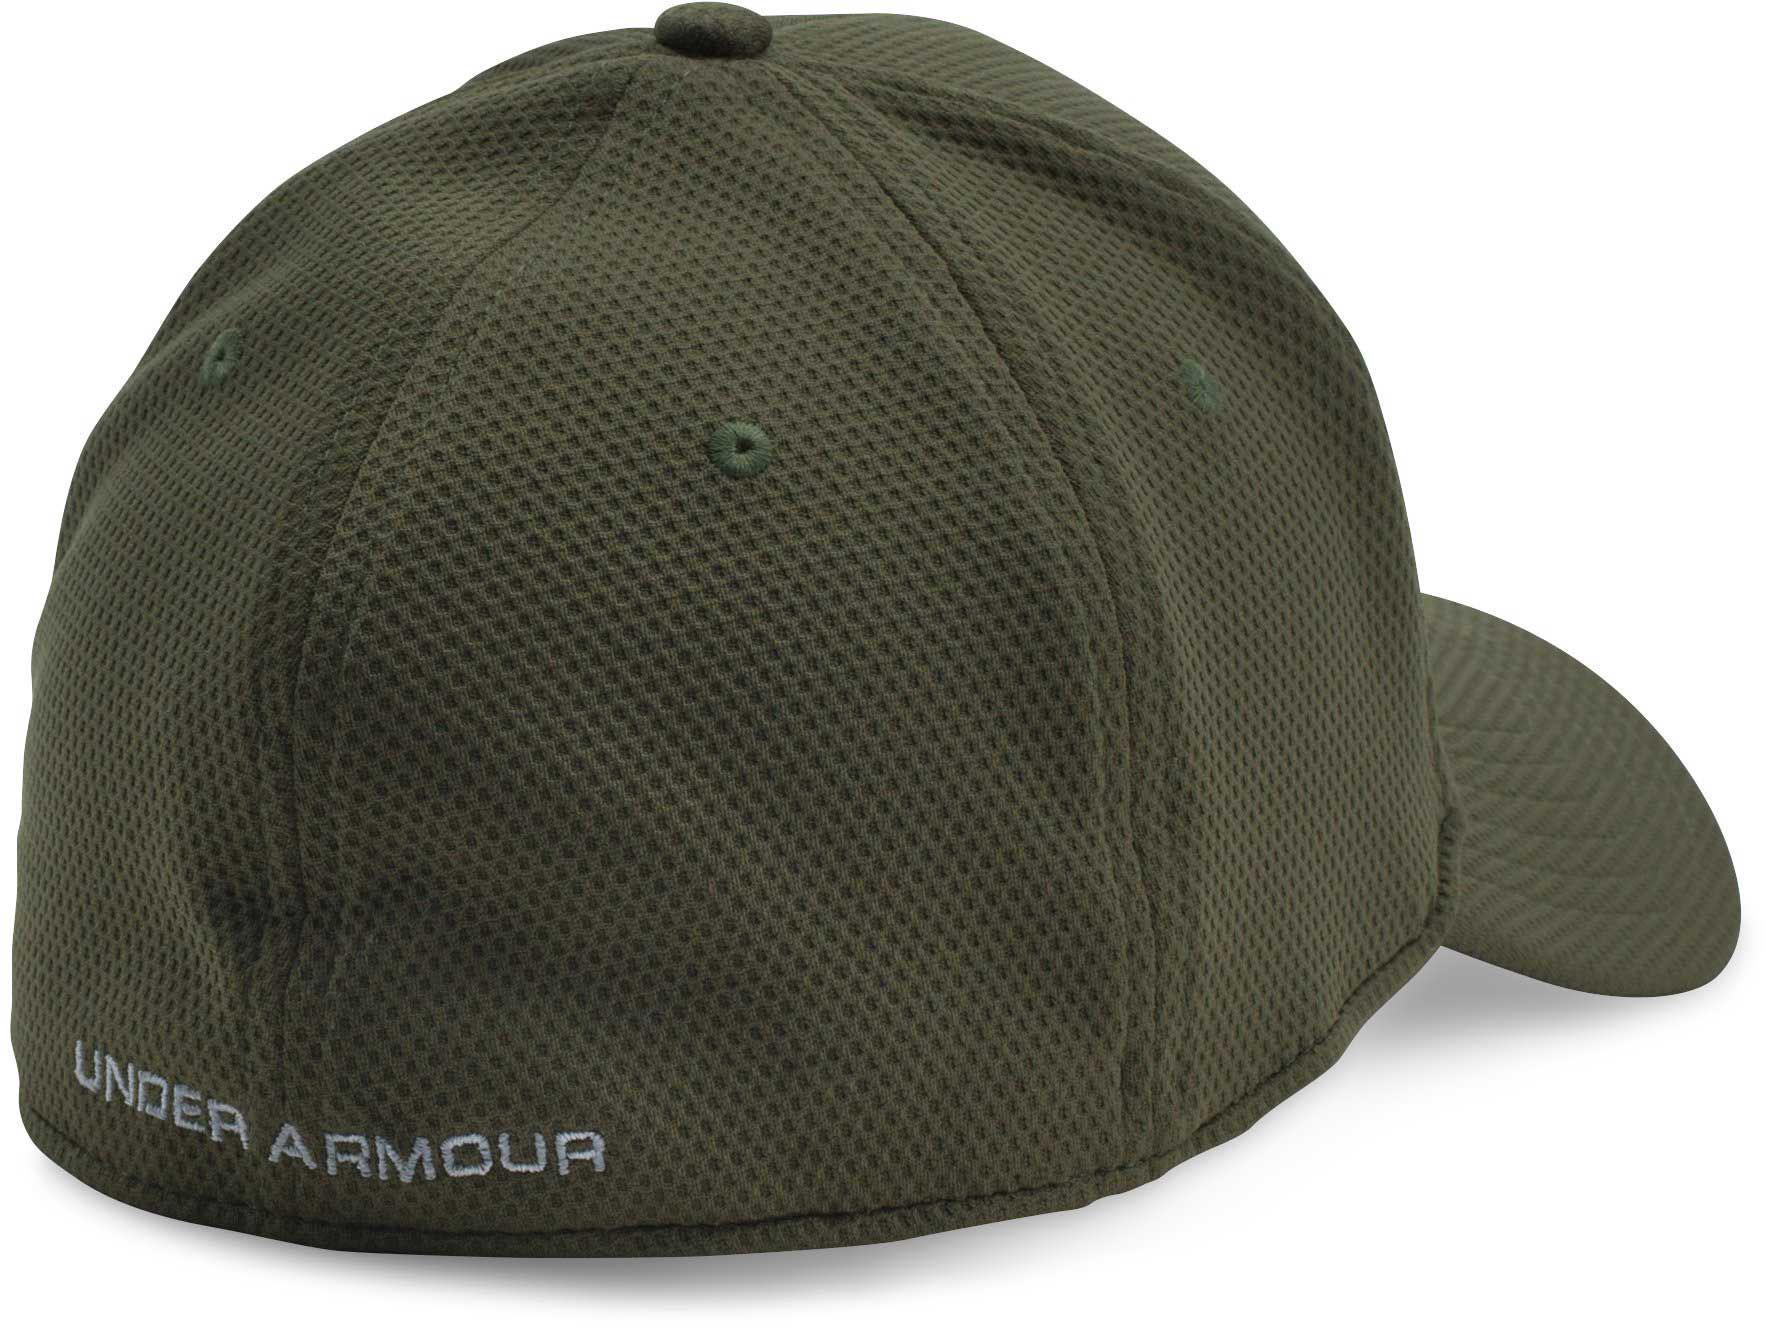 Under Armour - Green Men s Ua Blitzing Ii Stretch Fit Cap for Men - Lyst cf6ff48f6f8